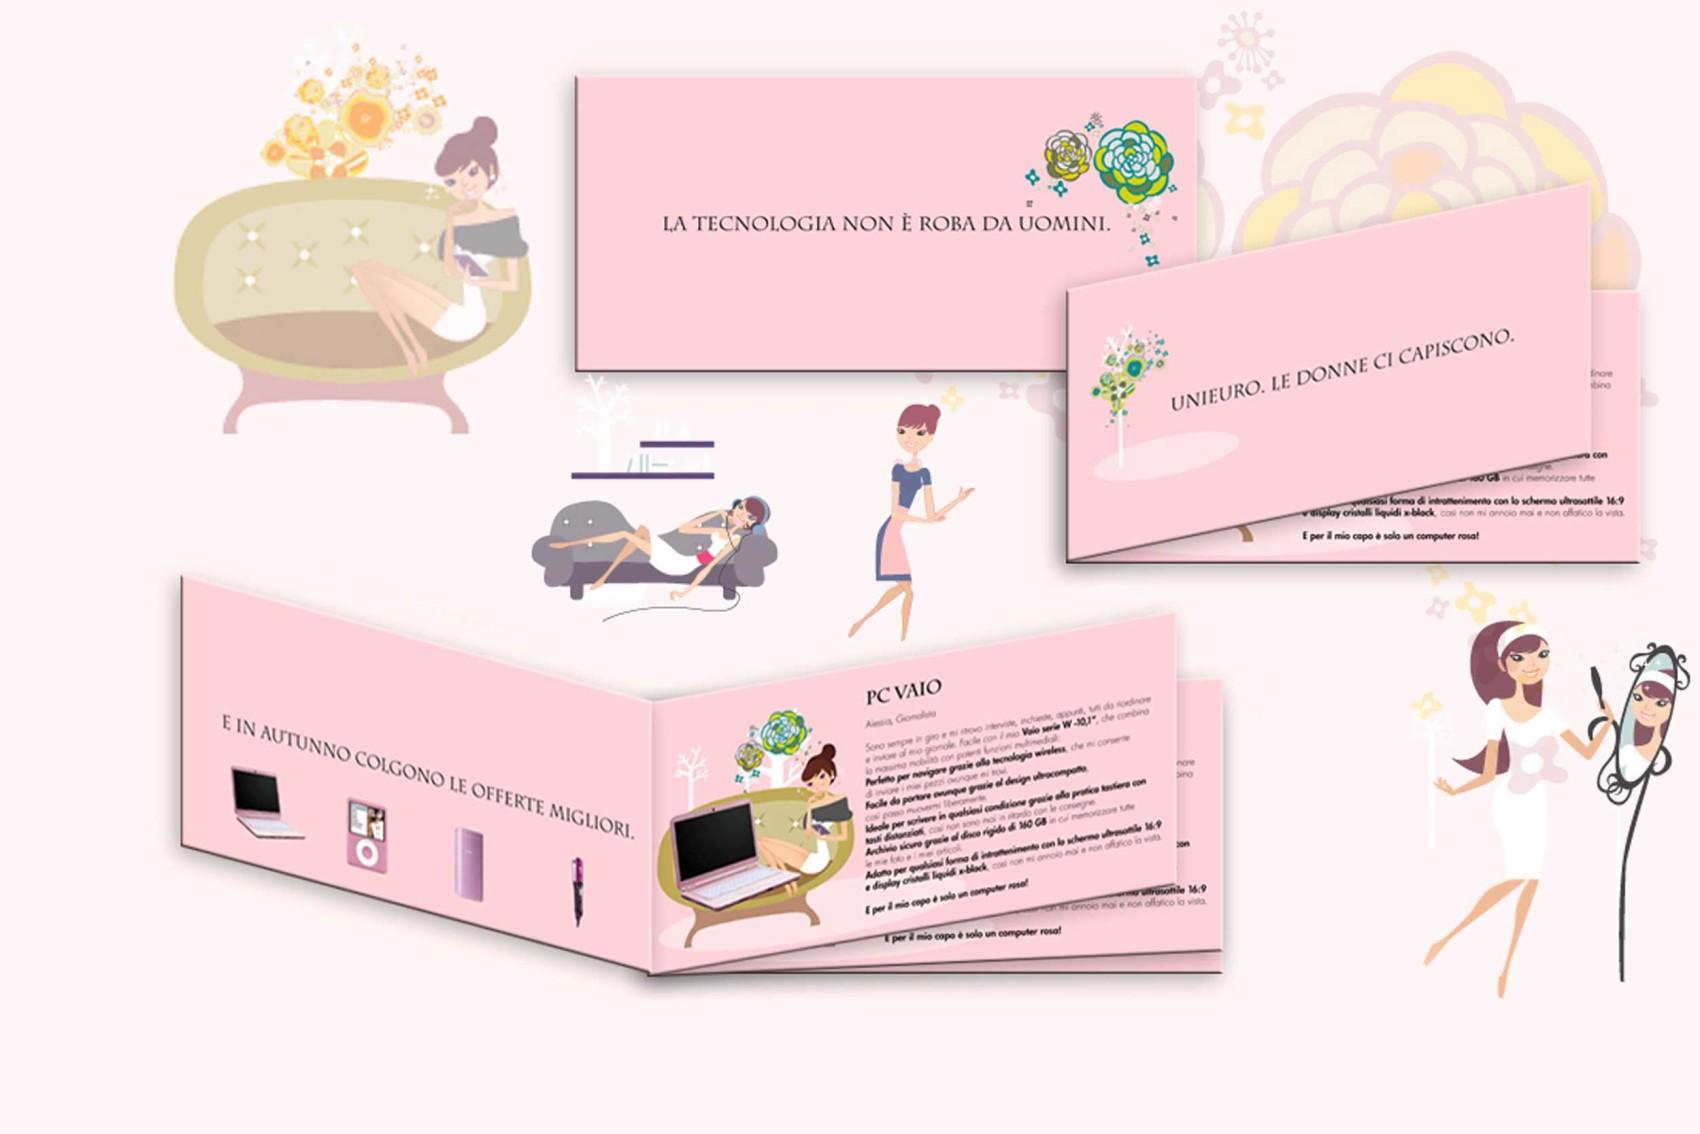 Project Grafico Milano – Grafica Freelance – Agnese Bartesaghi